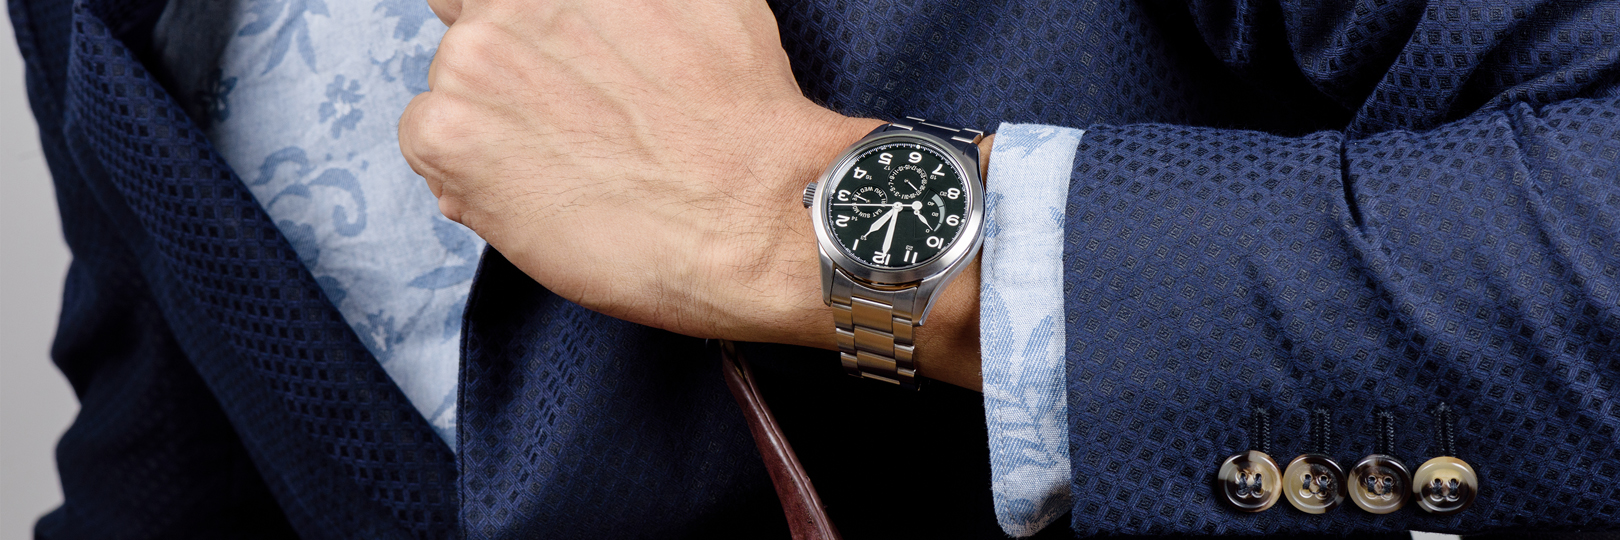 €89 Aquaswiss Αντρικό ή Unisex ρολόι